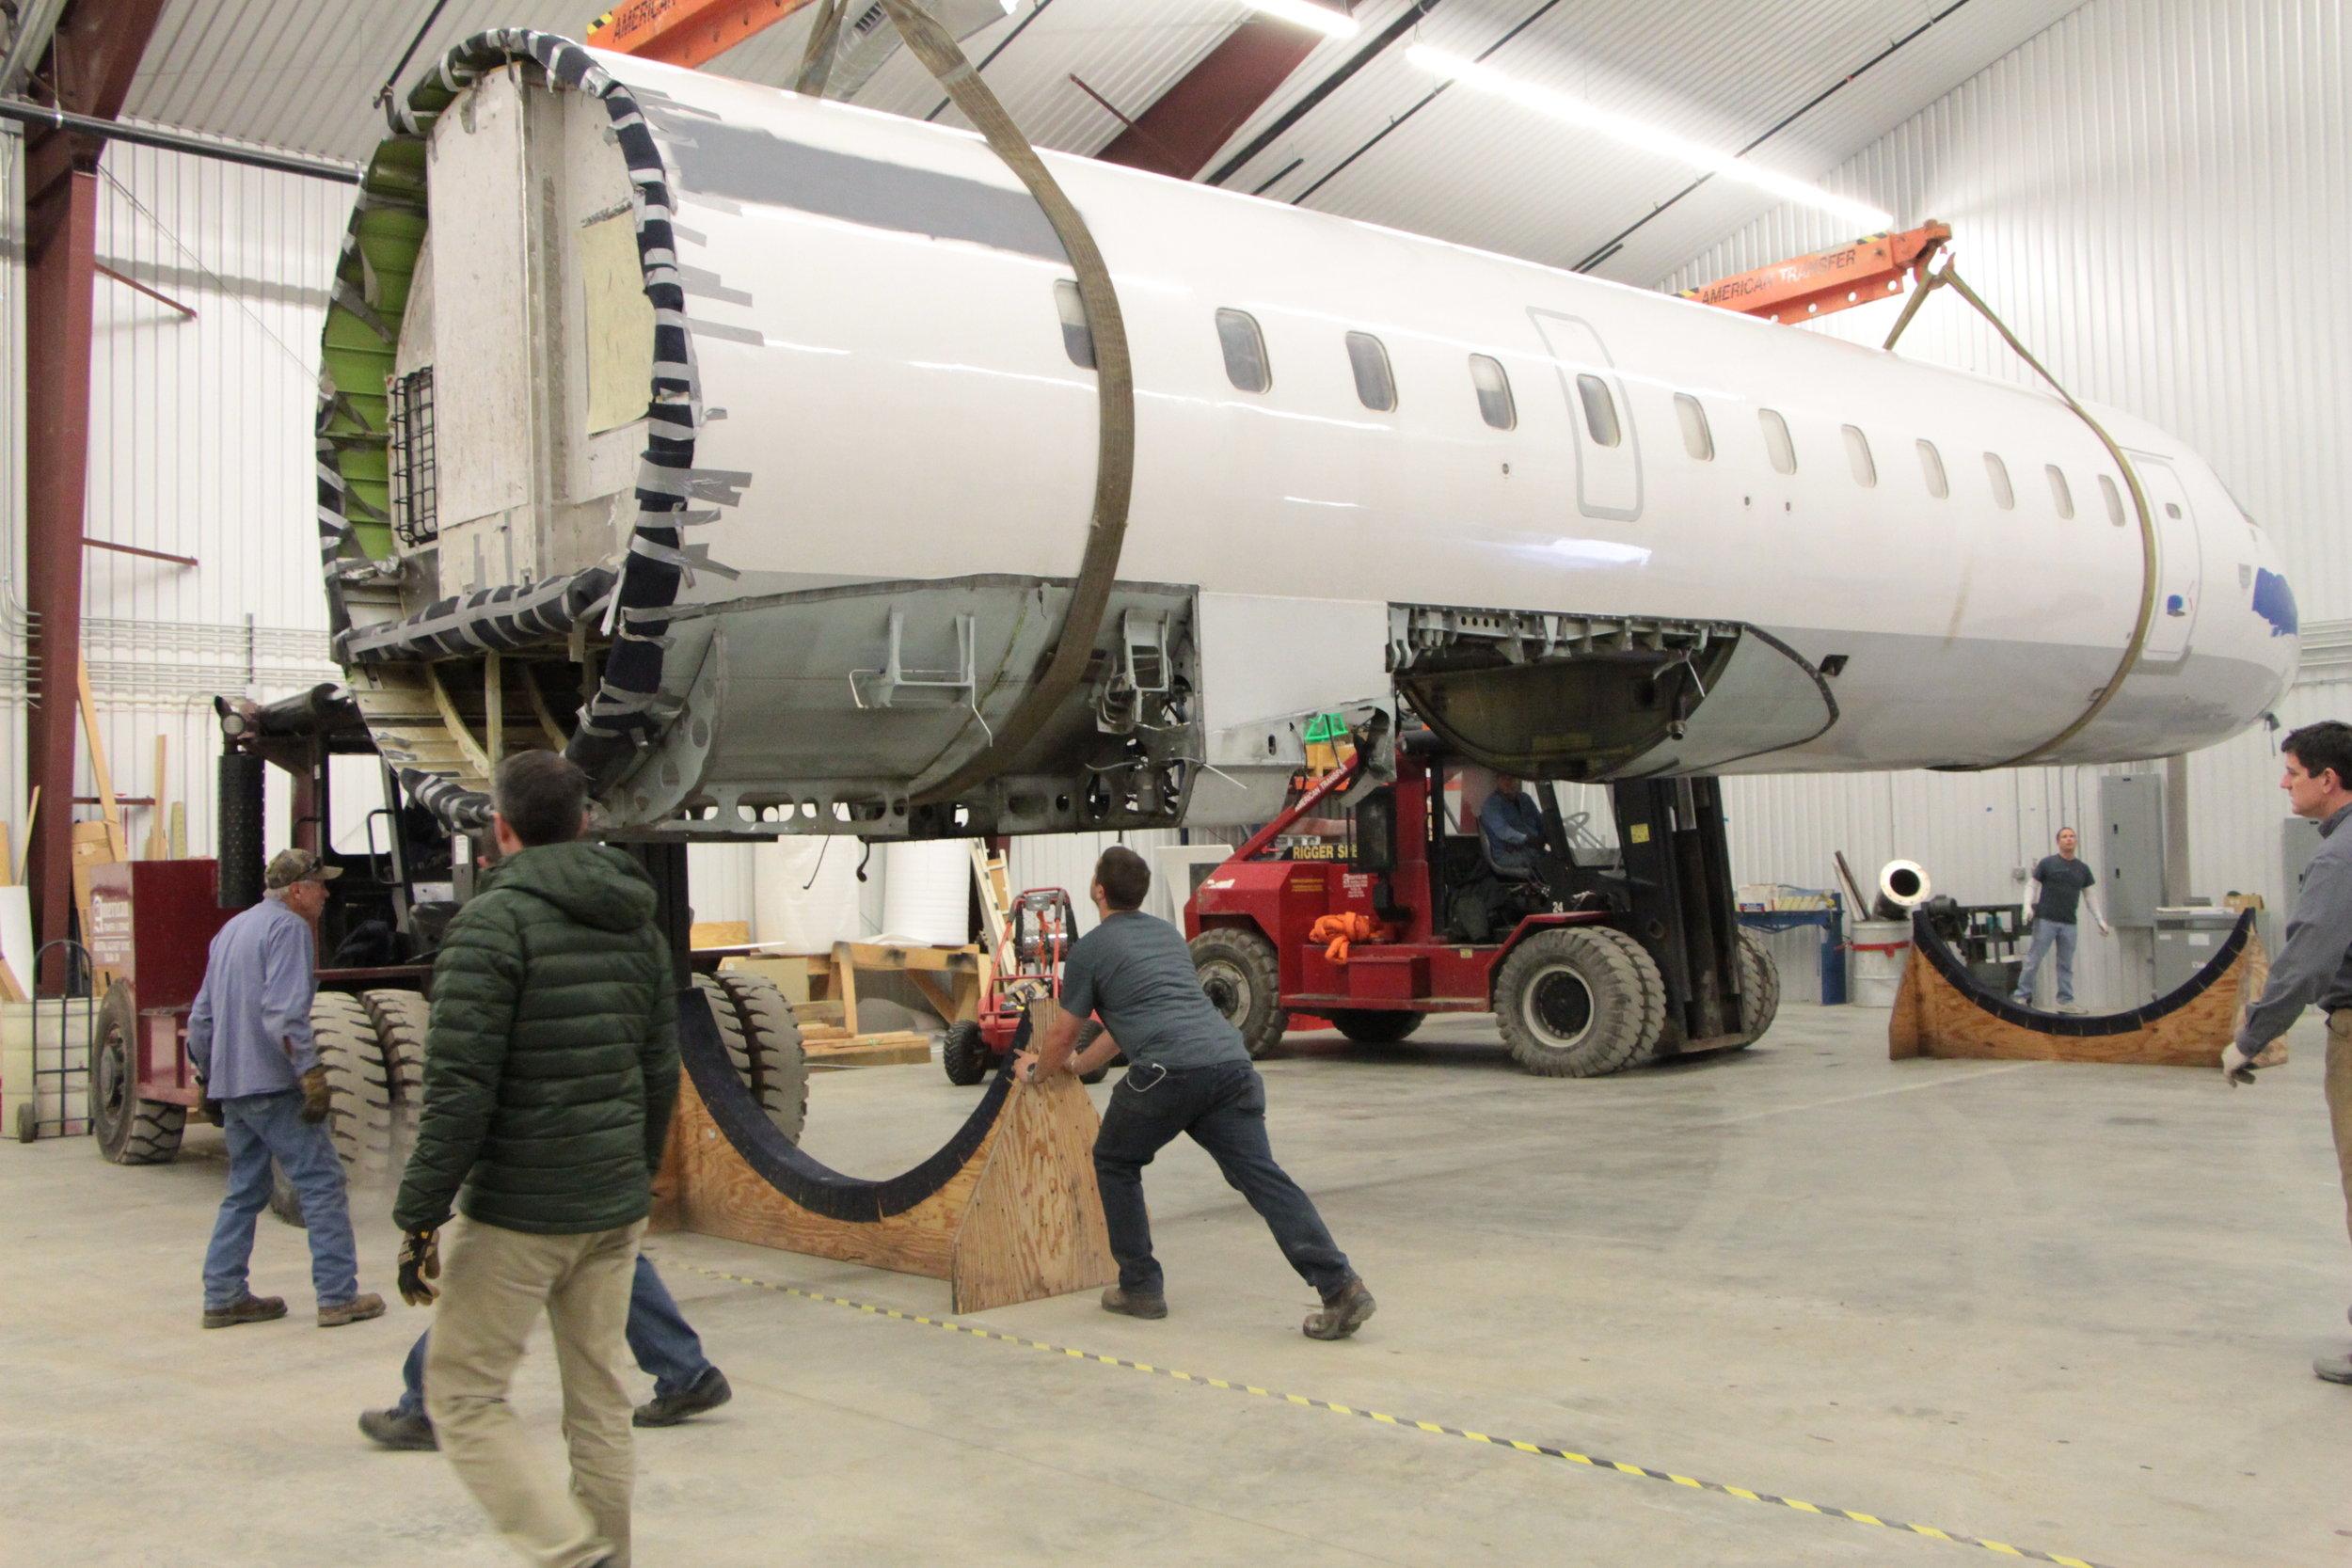 CRJ Cabin Trainer Under Construction